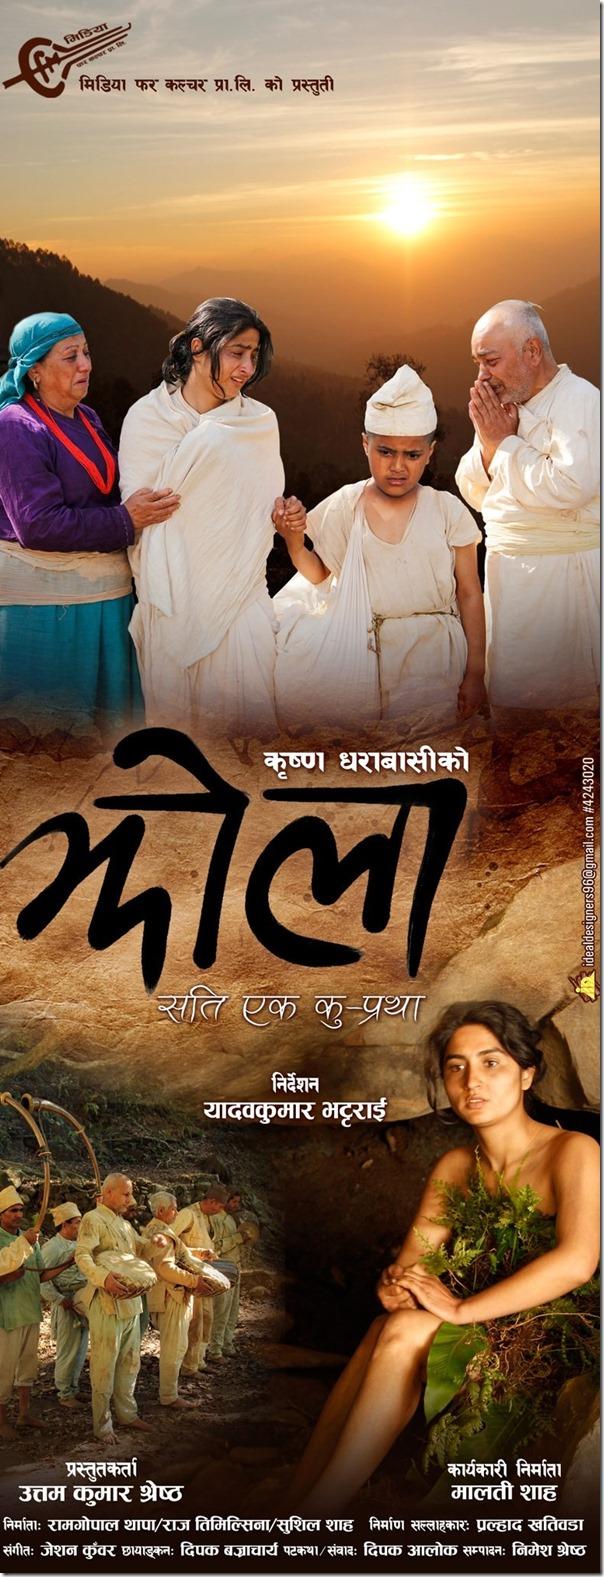 Jhola poster 2